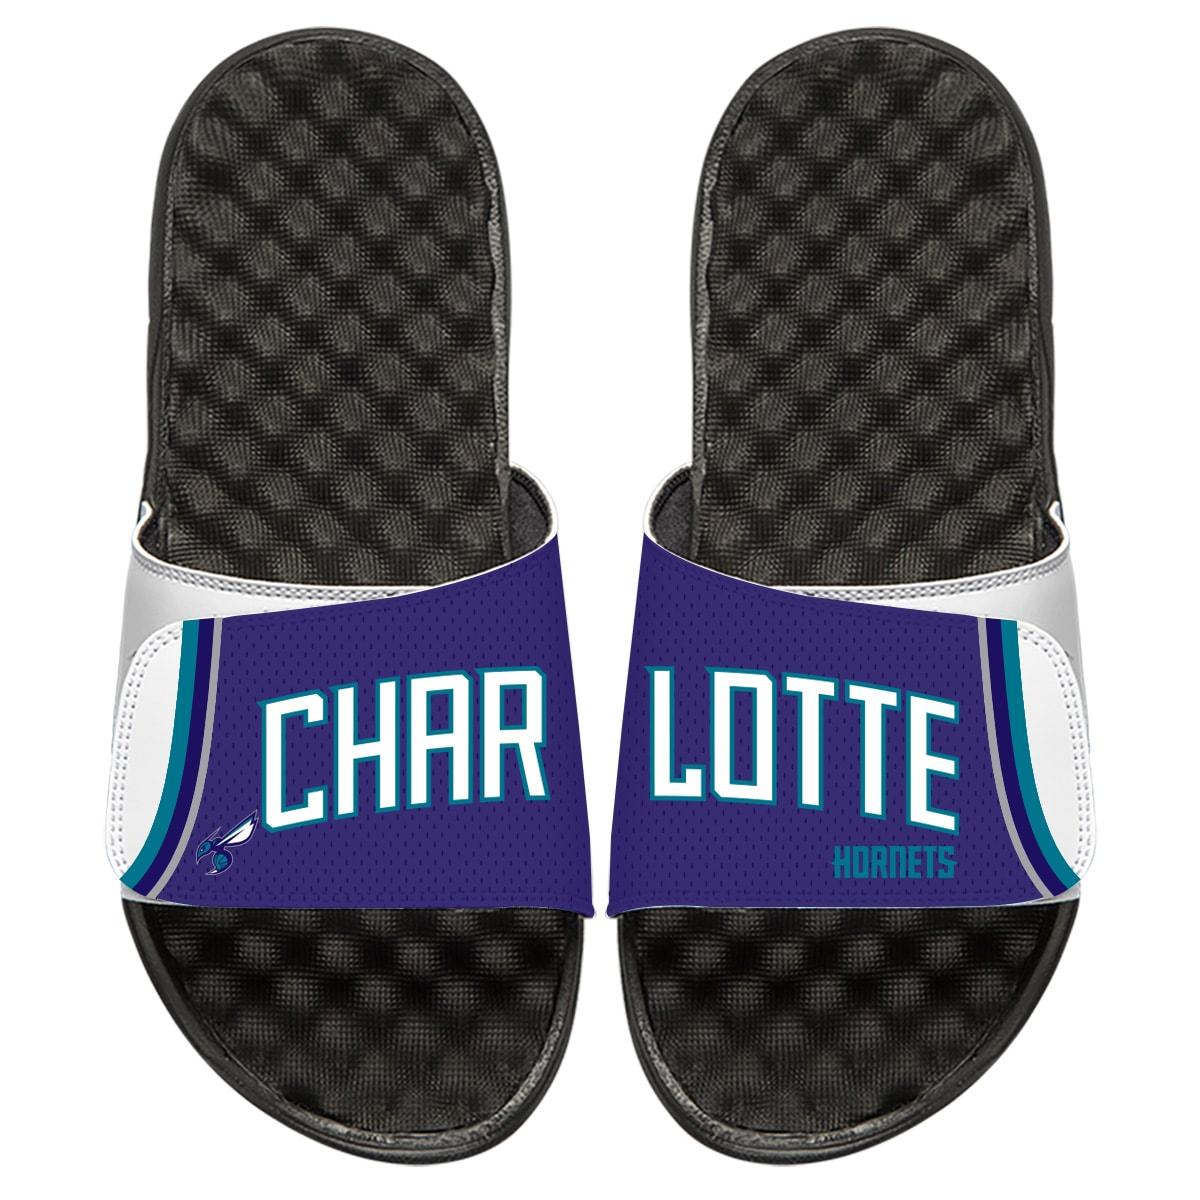 Charlotte Hornets ISlide Youth Statement Jersey Split Slide Sandals - White